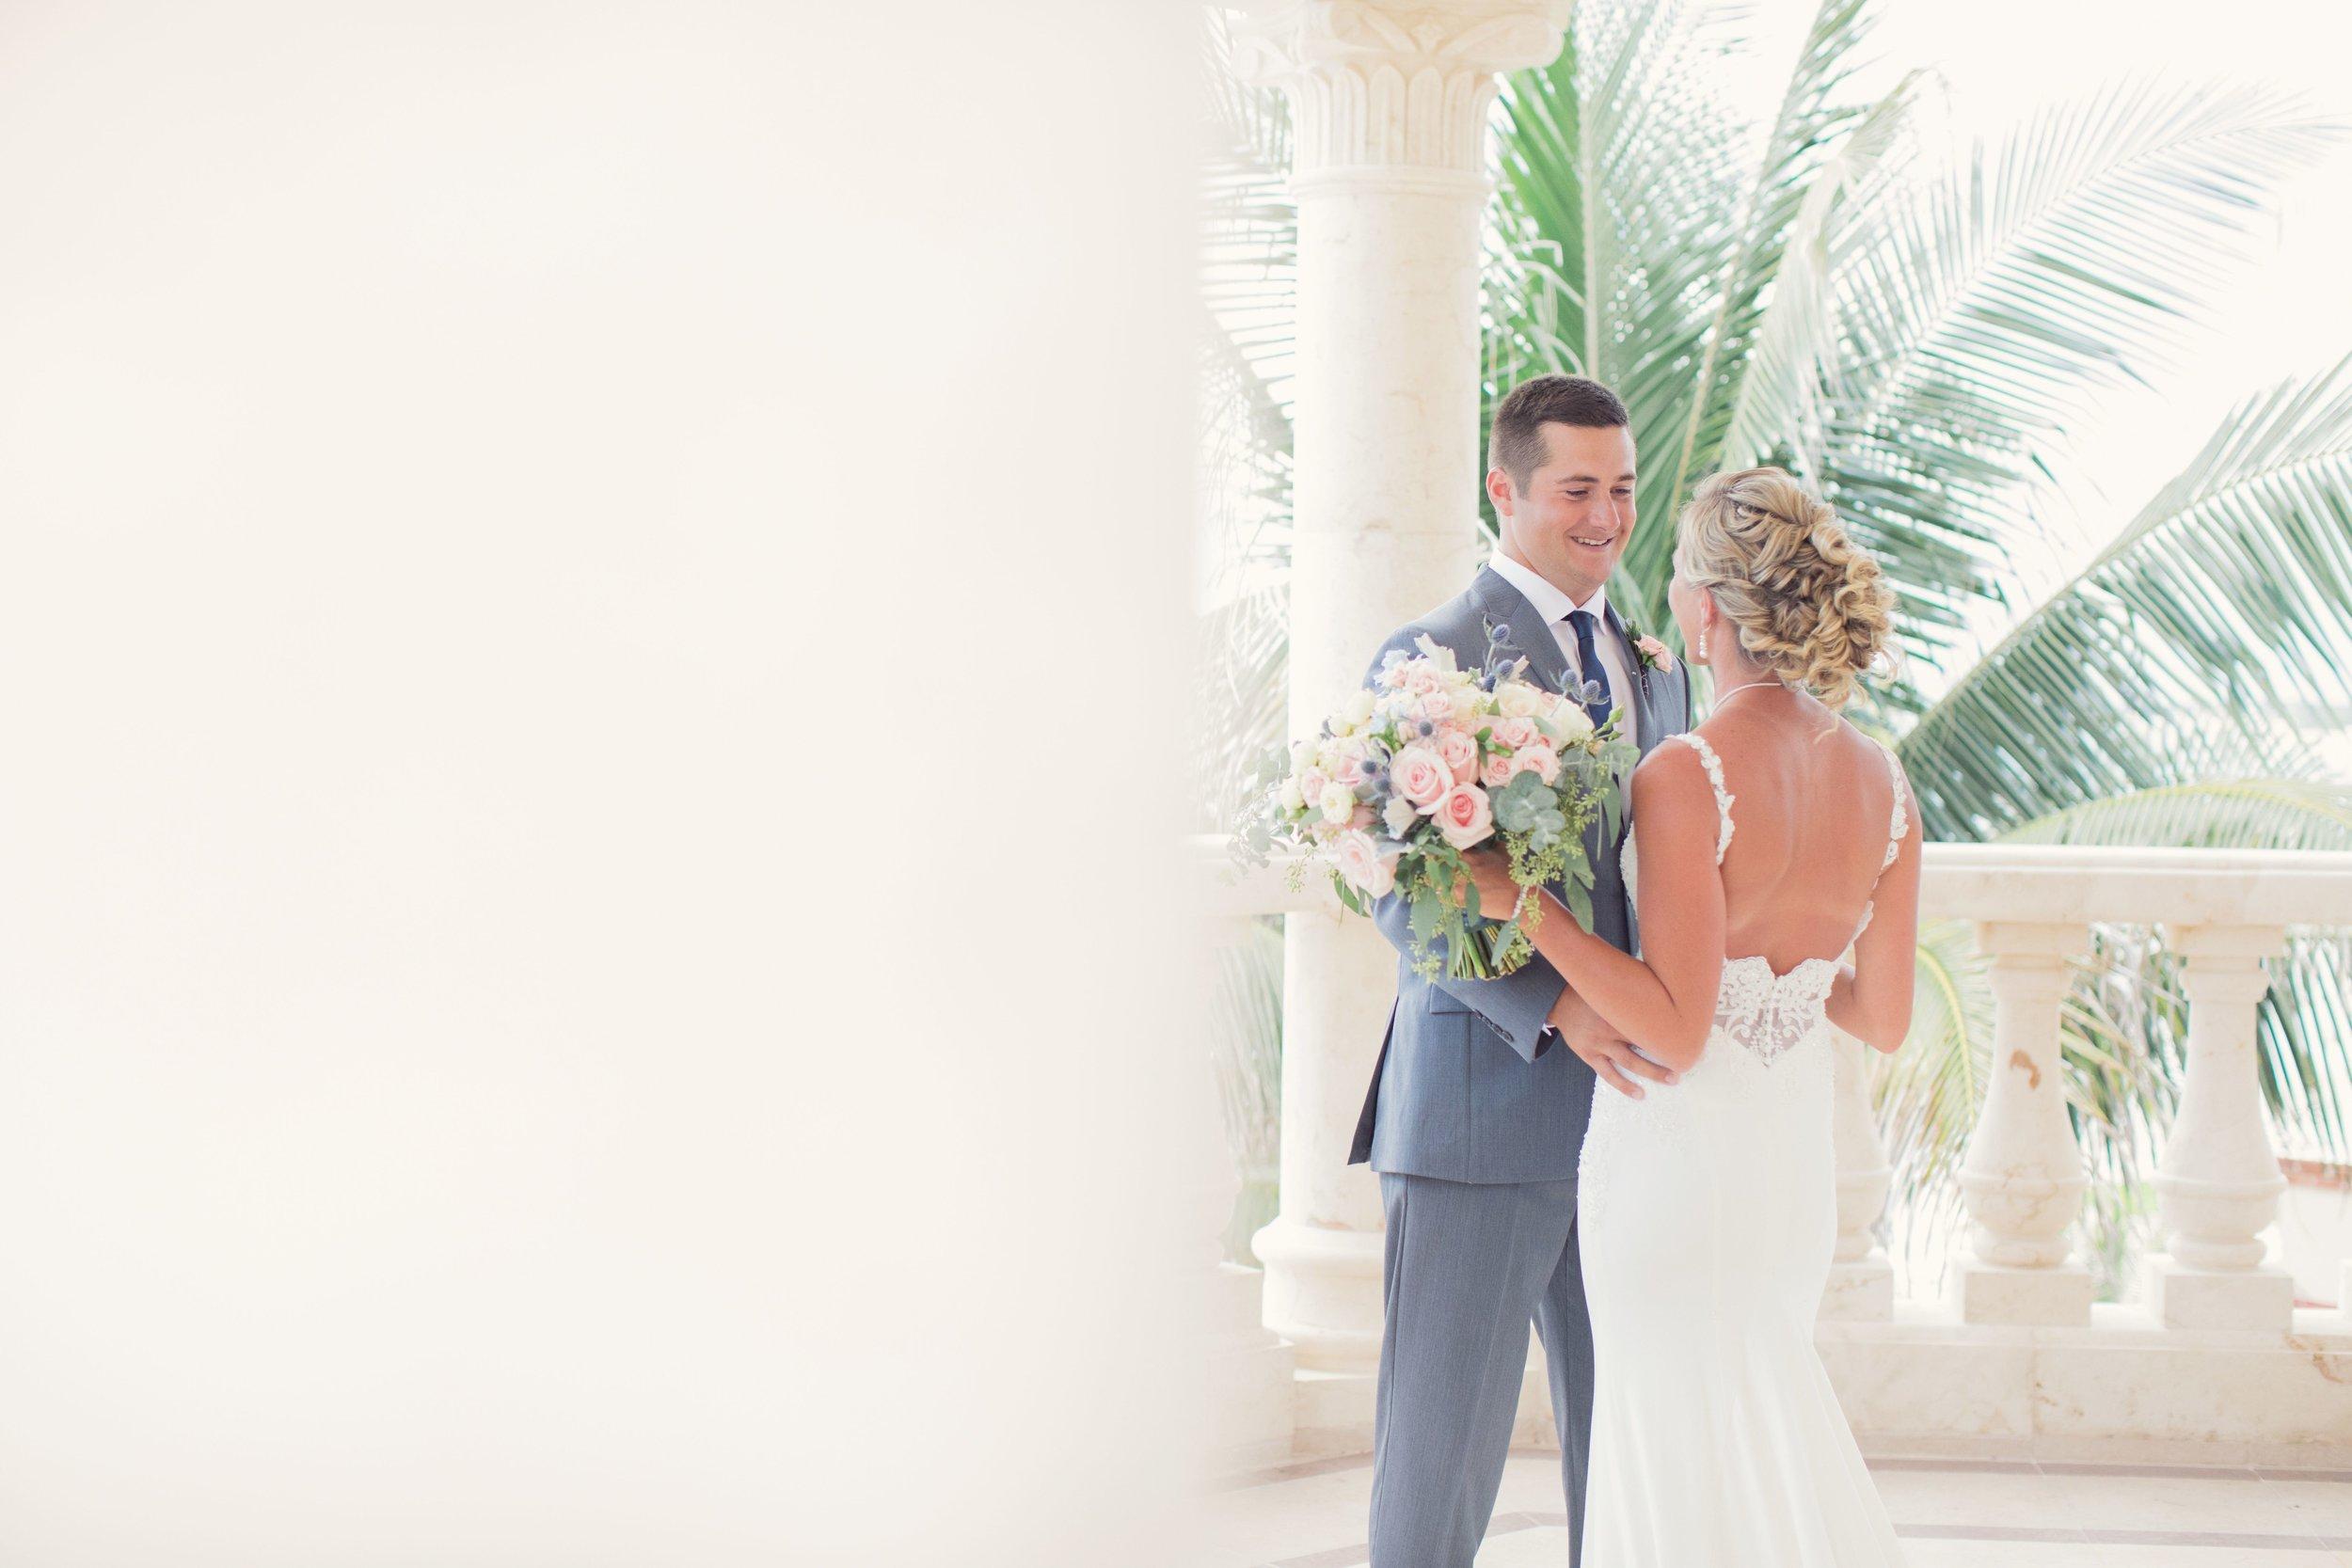 cancun-wedding-venue-villa-la-joya-51 copy-websize.jpg